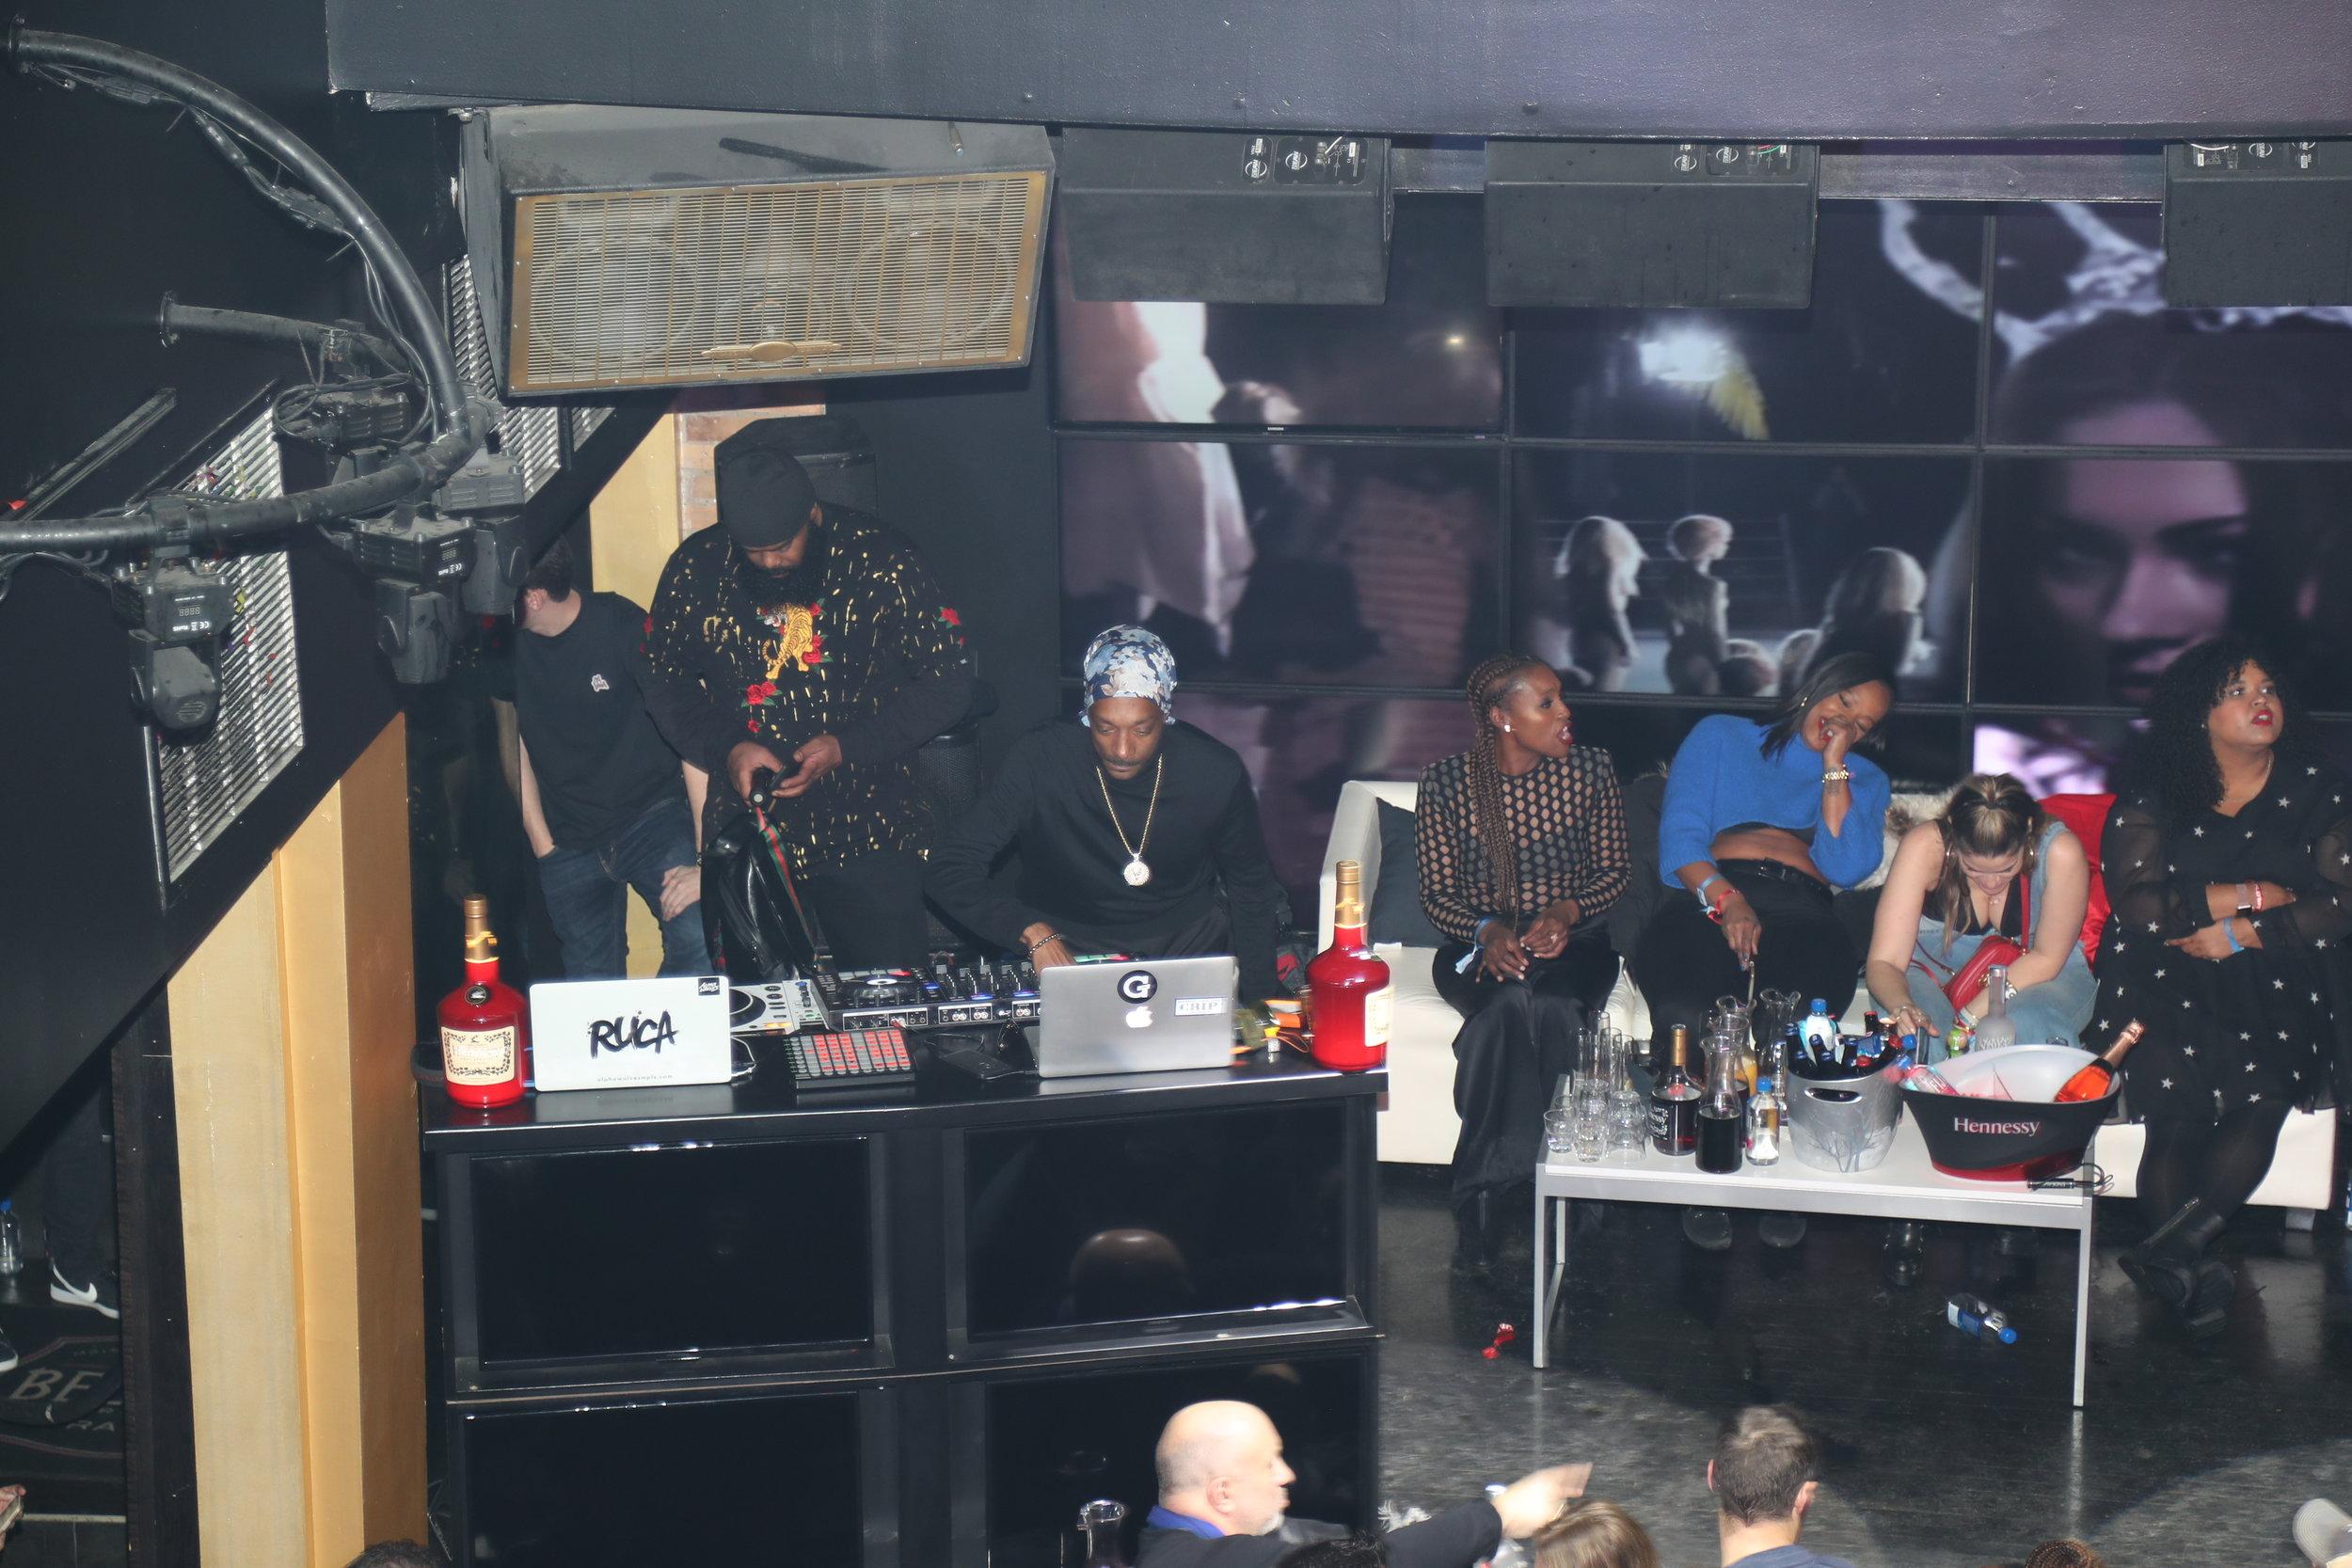 Snoop Dogg DJing at Playboy's Big Game Party